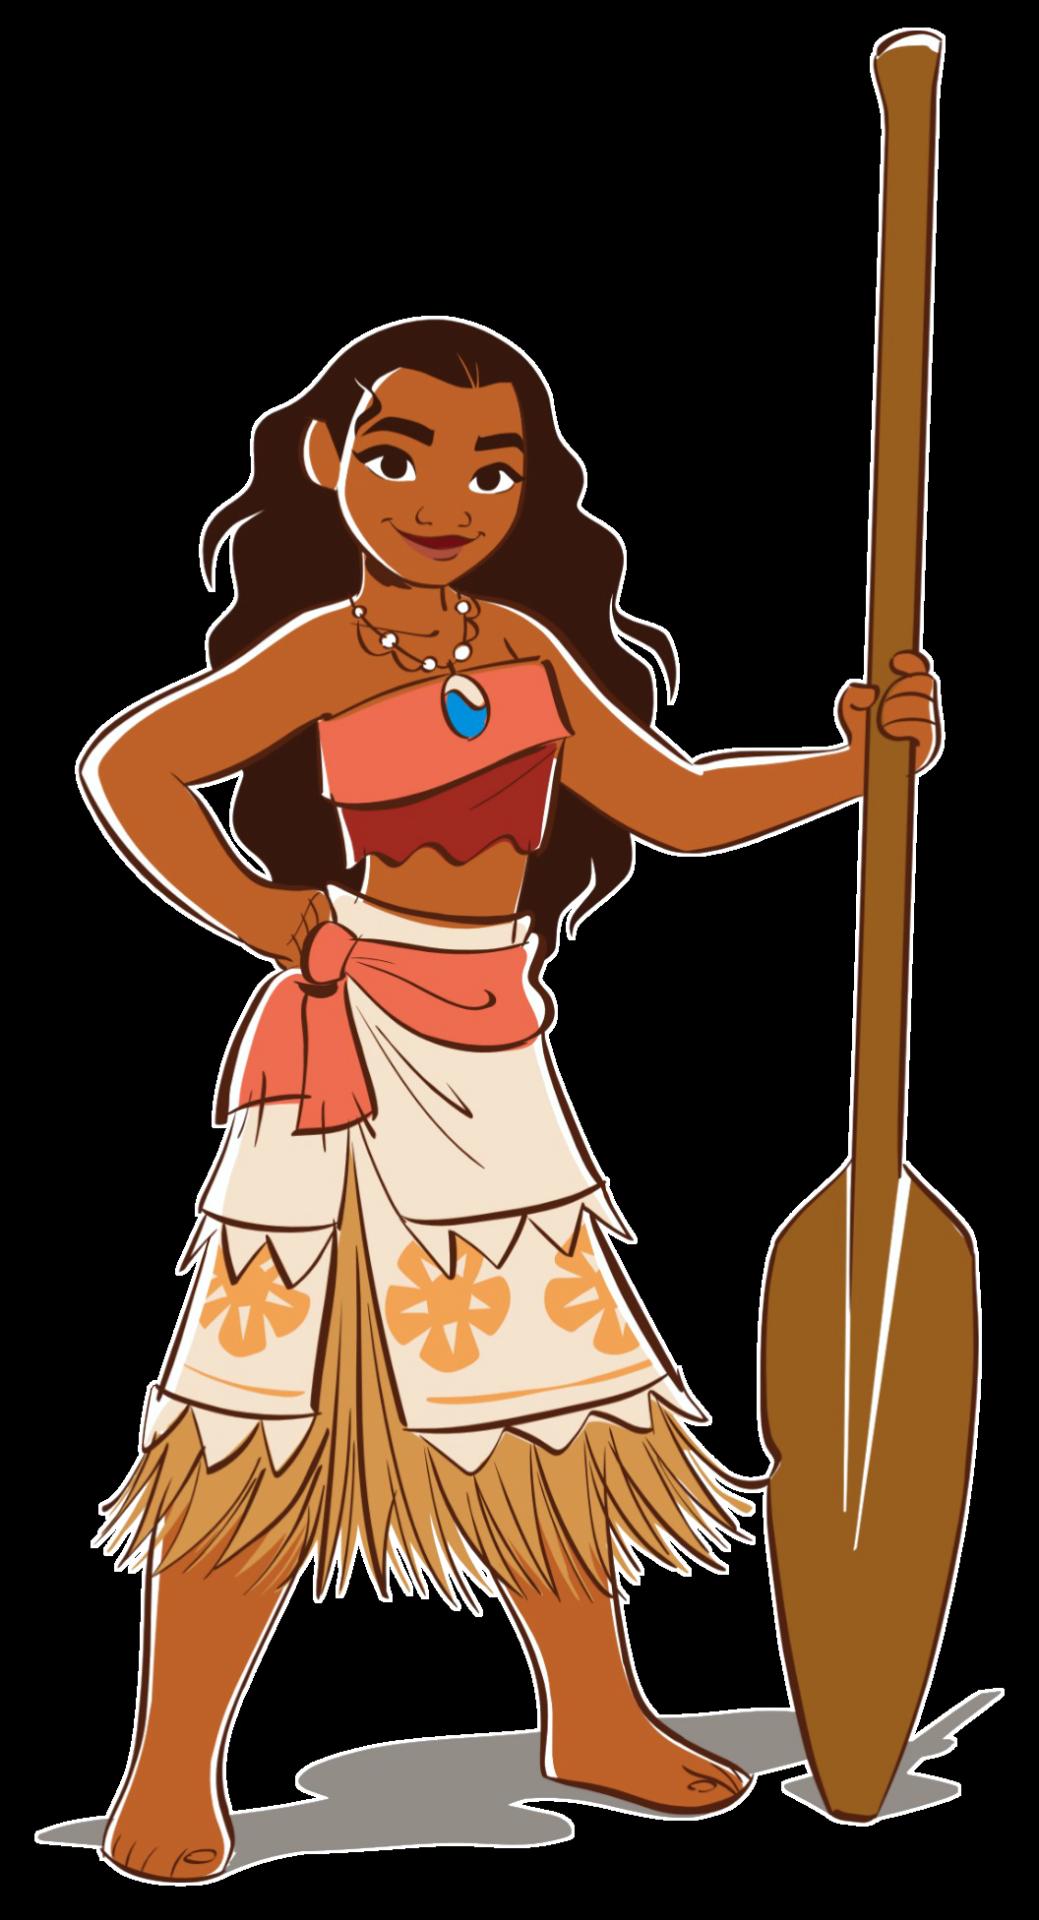 Image - Moana 2D Artwork.png | Disney Wiki | FANDOM